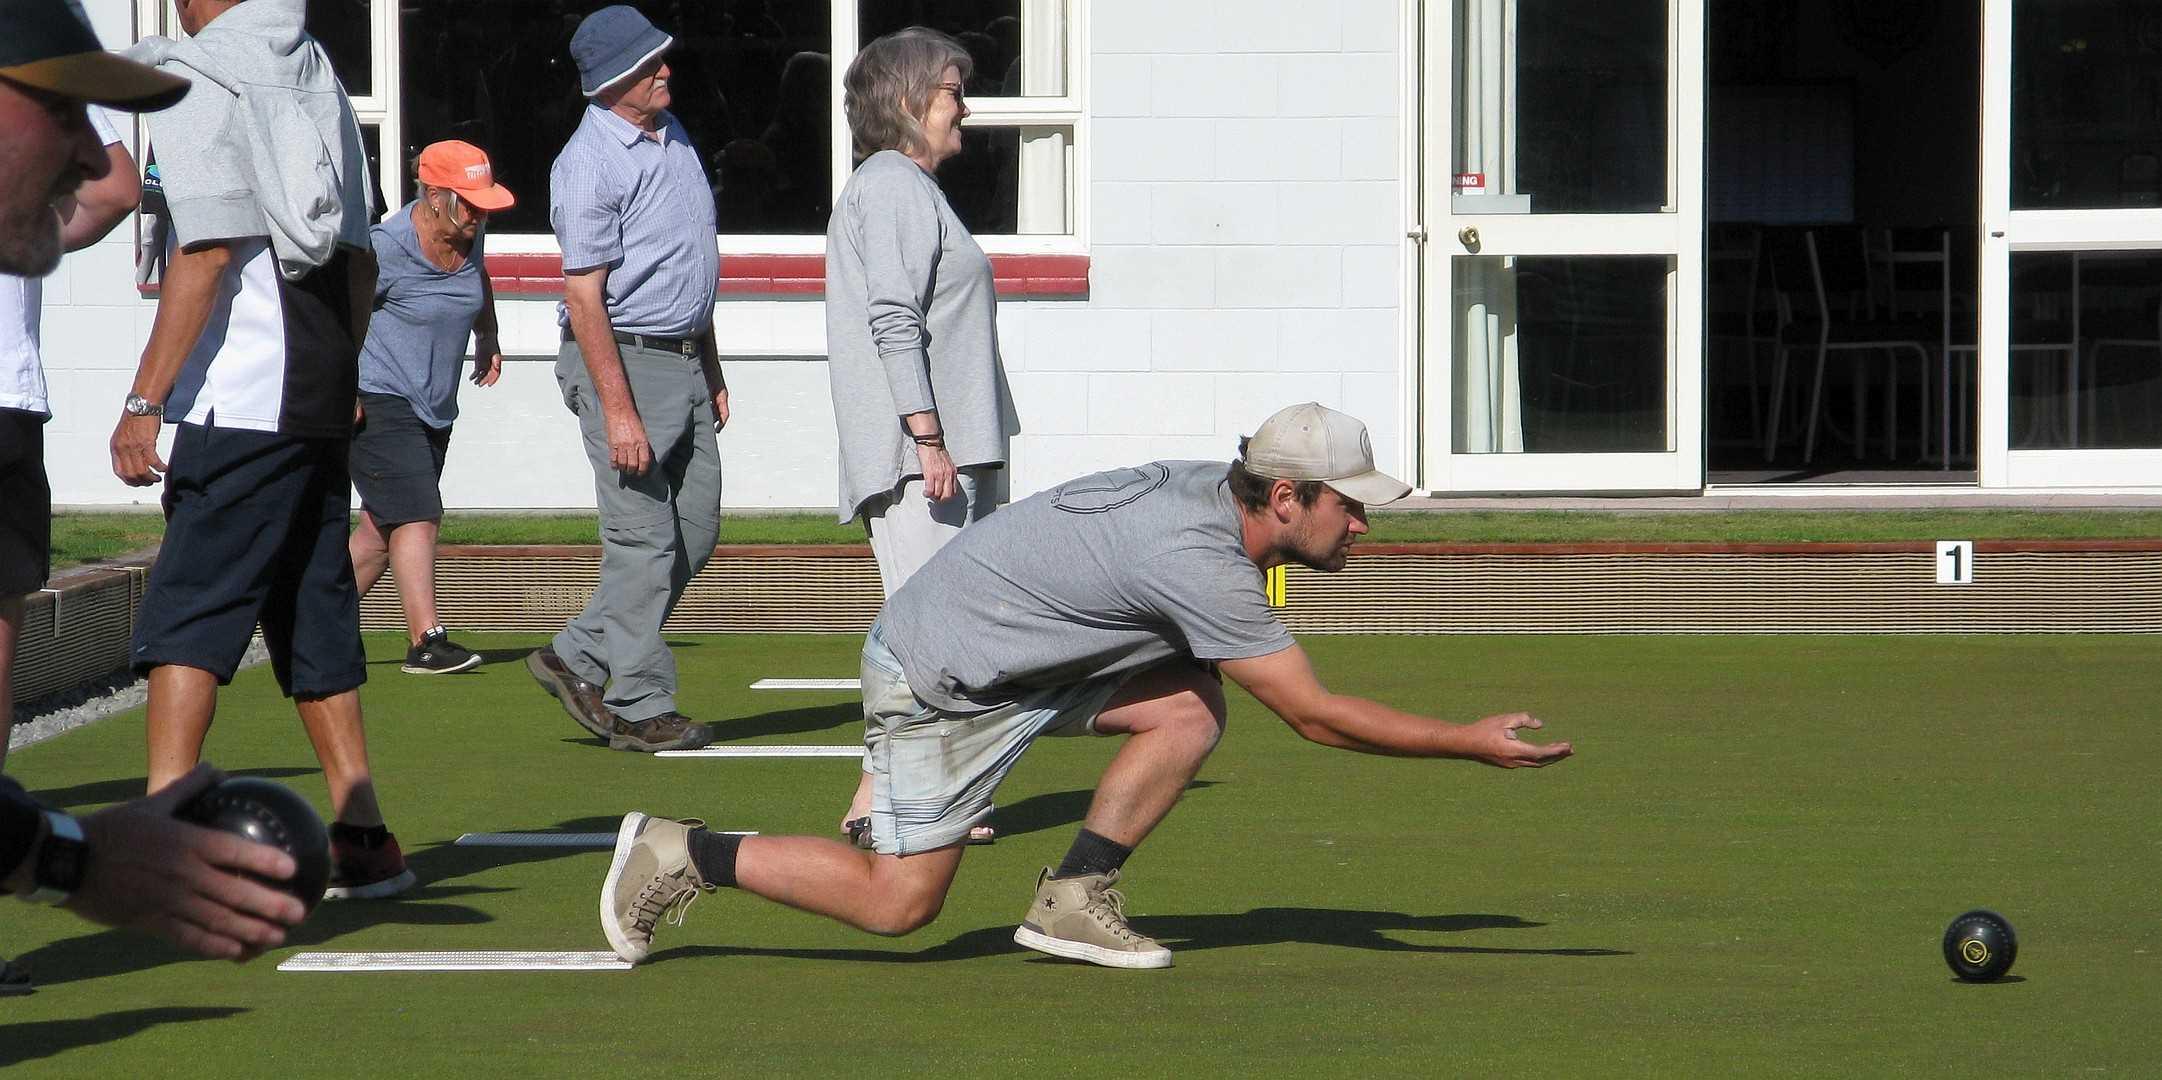 Community Bowls 18 Jan 2021